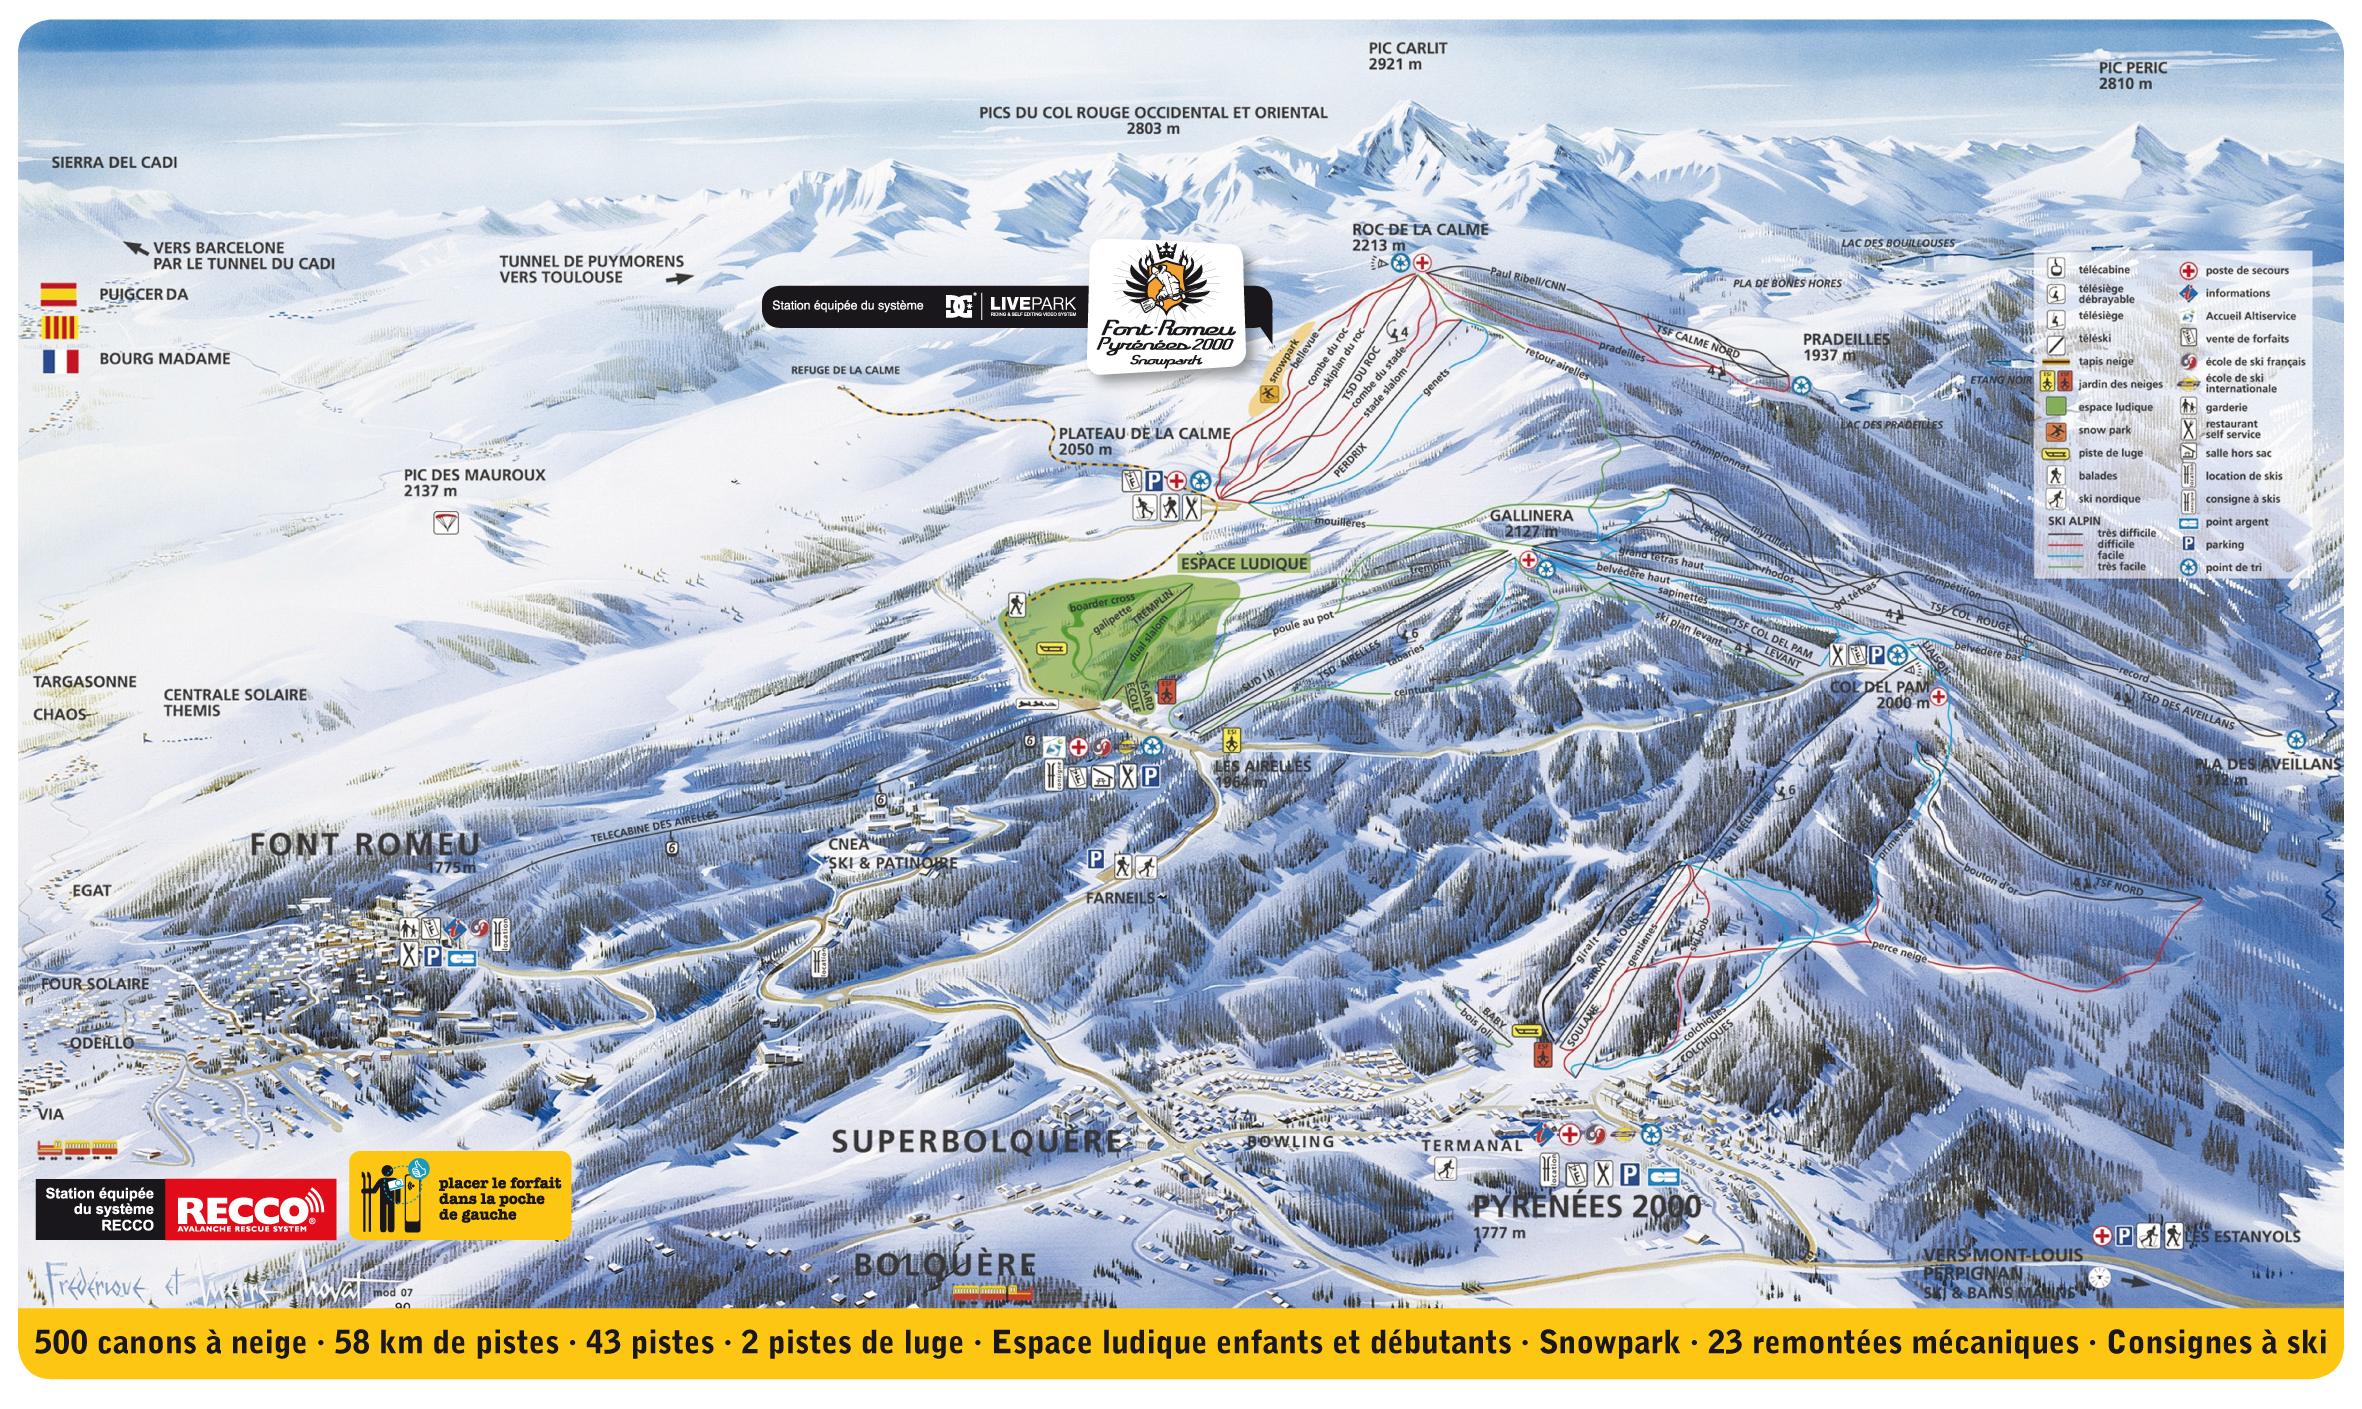 Ski Font Romeu